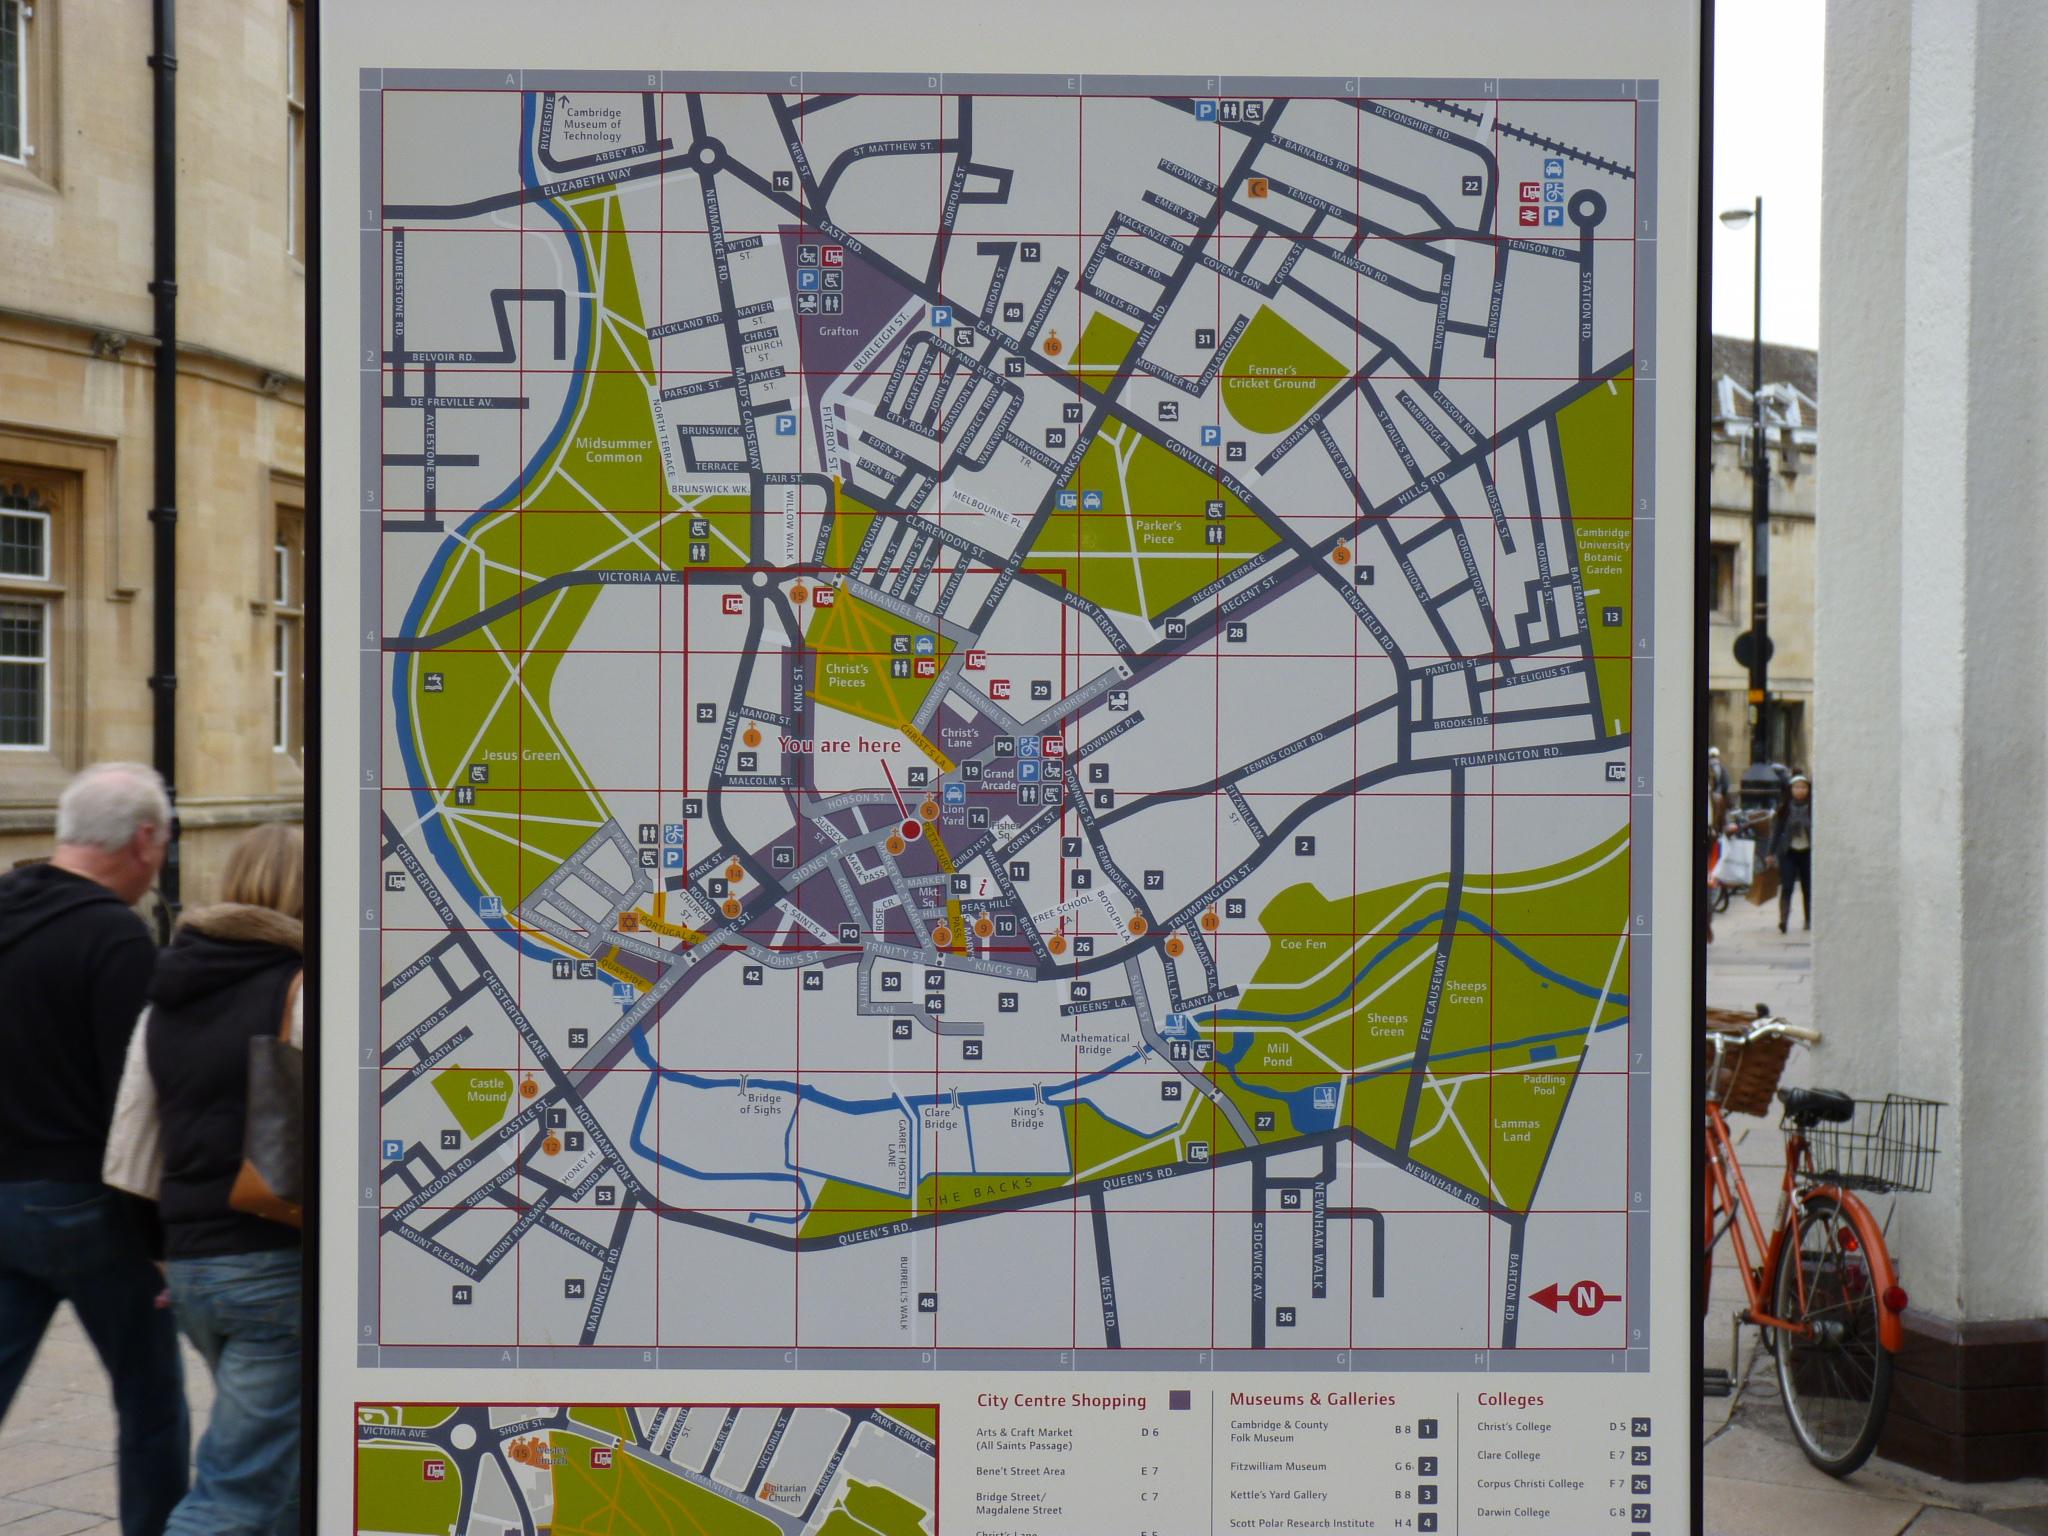 Cambridge Way Finding Map, Cavendish Square, city centre